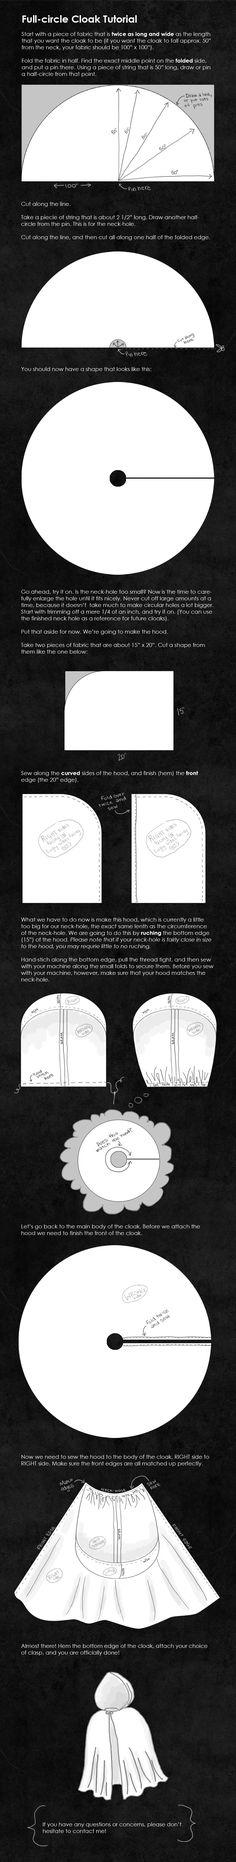 Full-Circle Cloak Tutorial by ti-DESIGN.deviantart.com on @deviantART